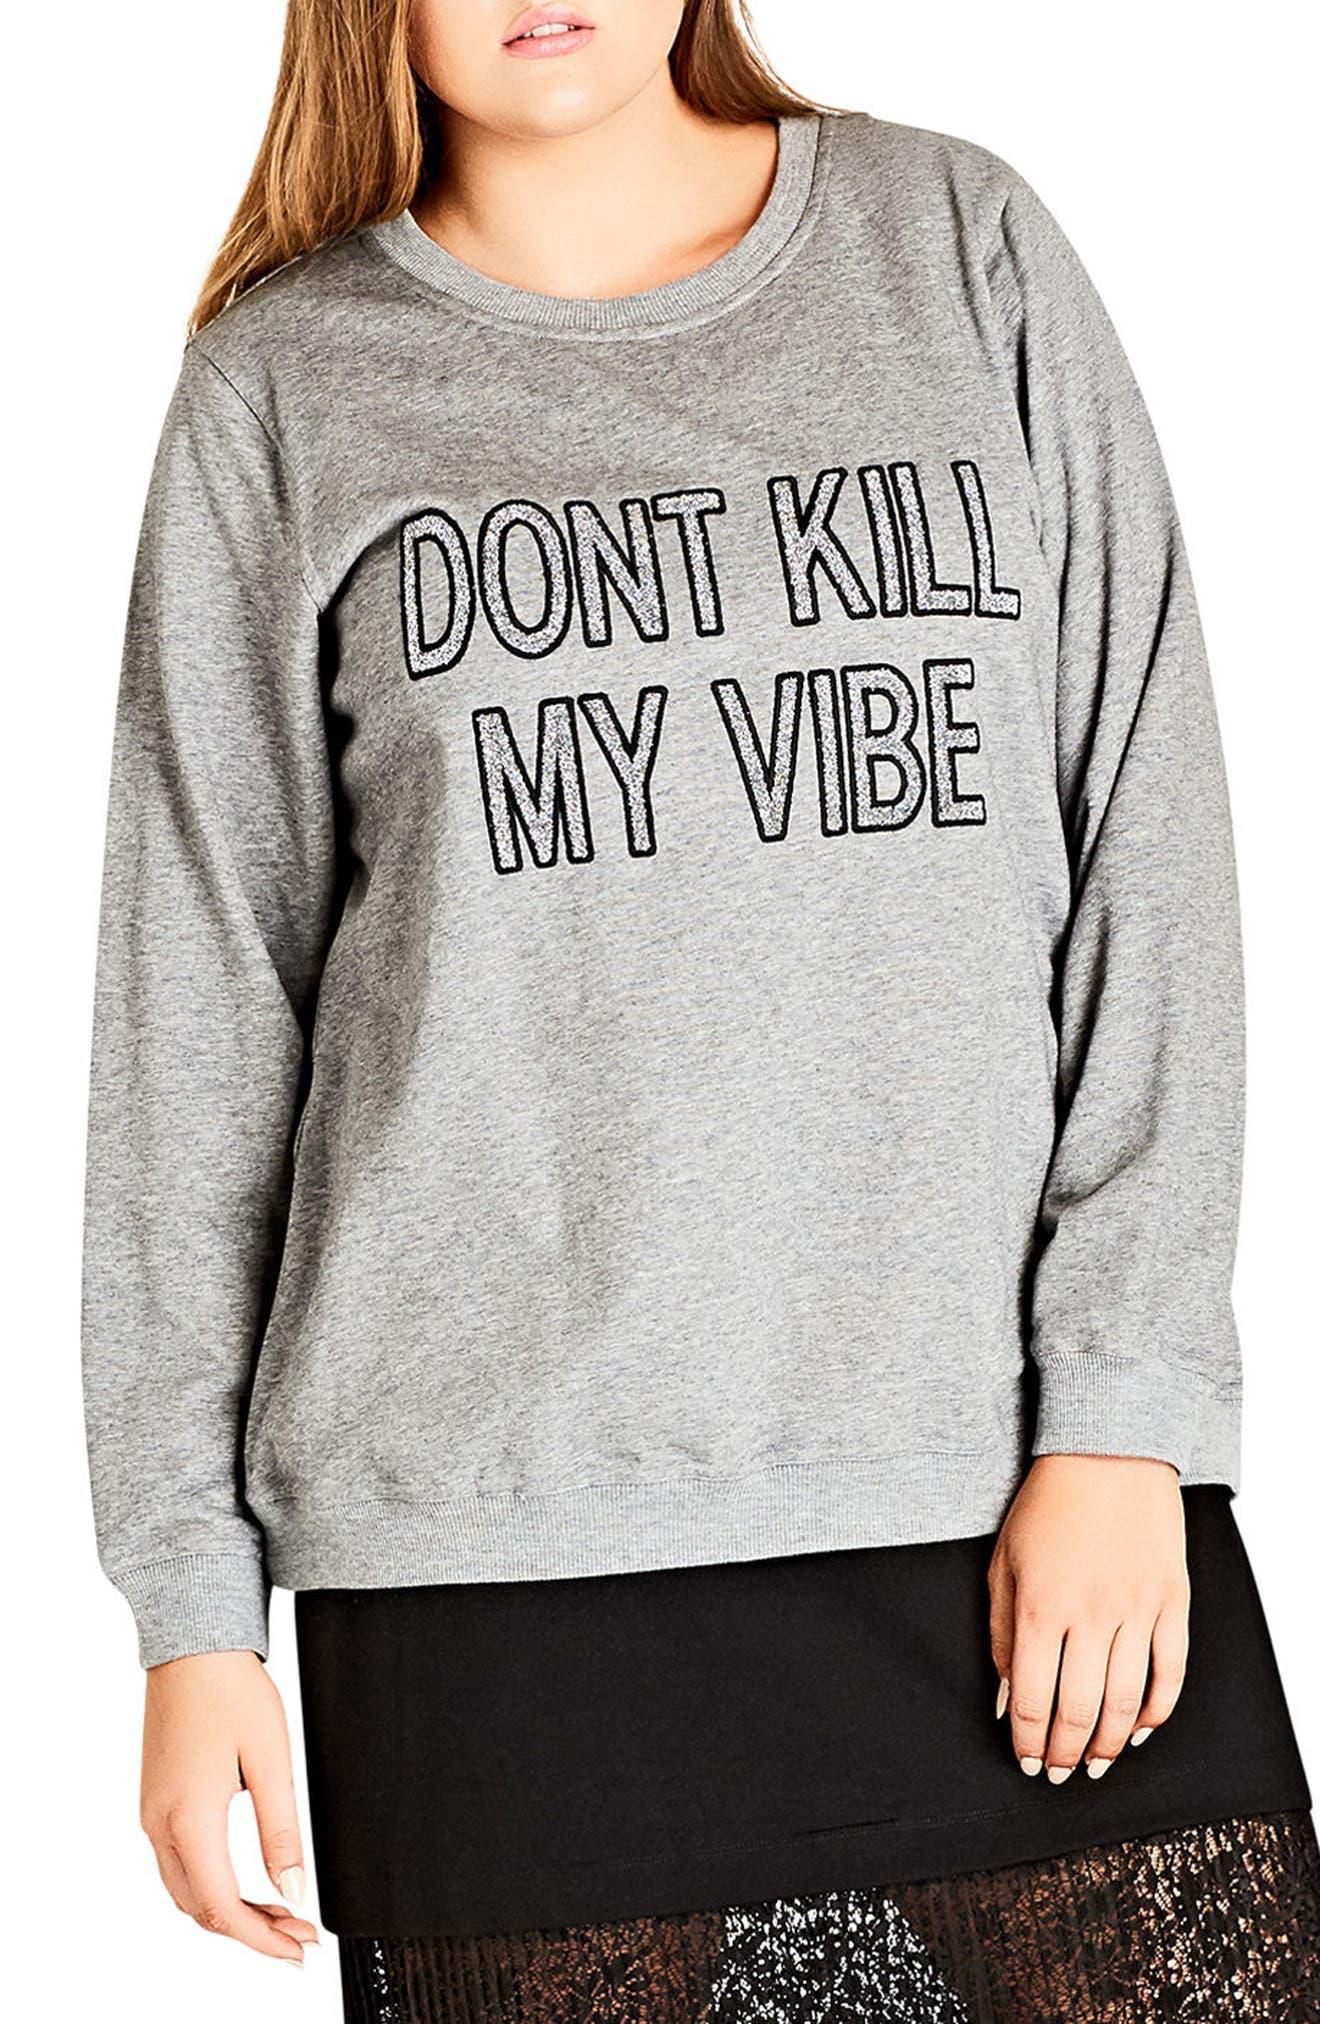 Vibes Glitter Graphic Sweatshirt,                         Main,                         color, Grey Marle